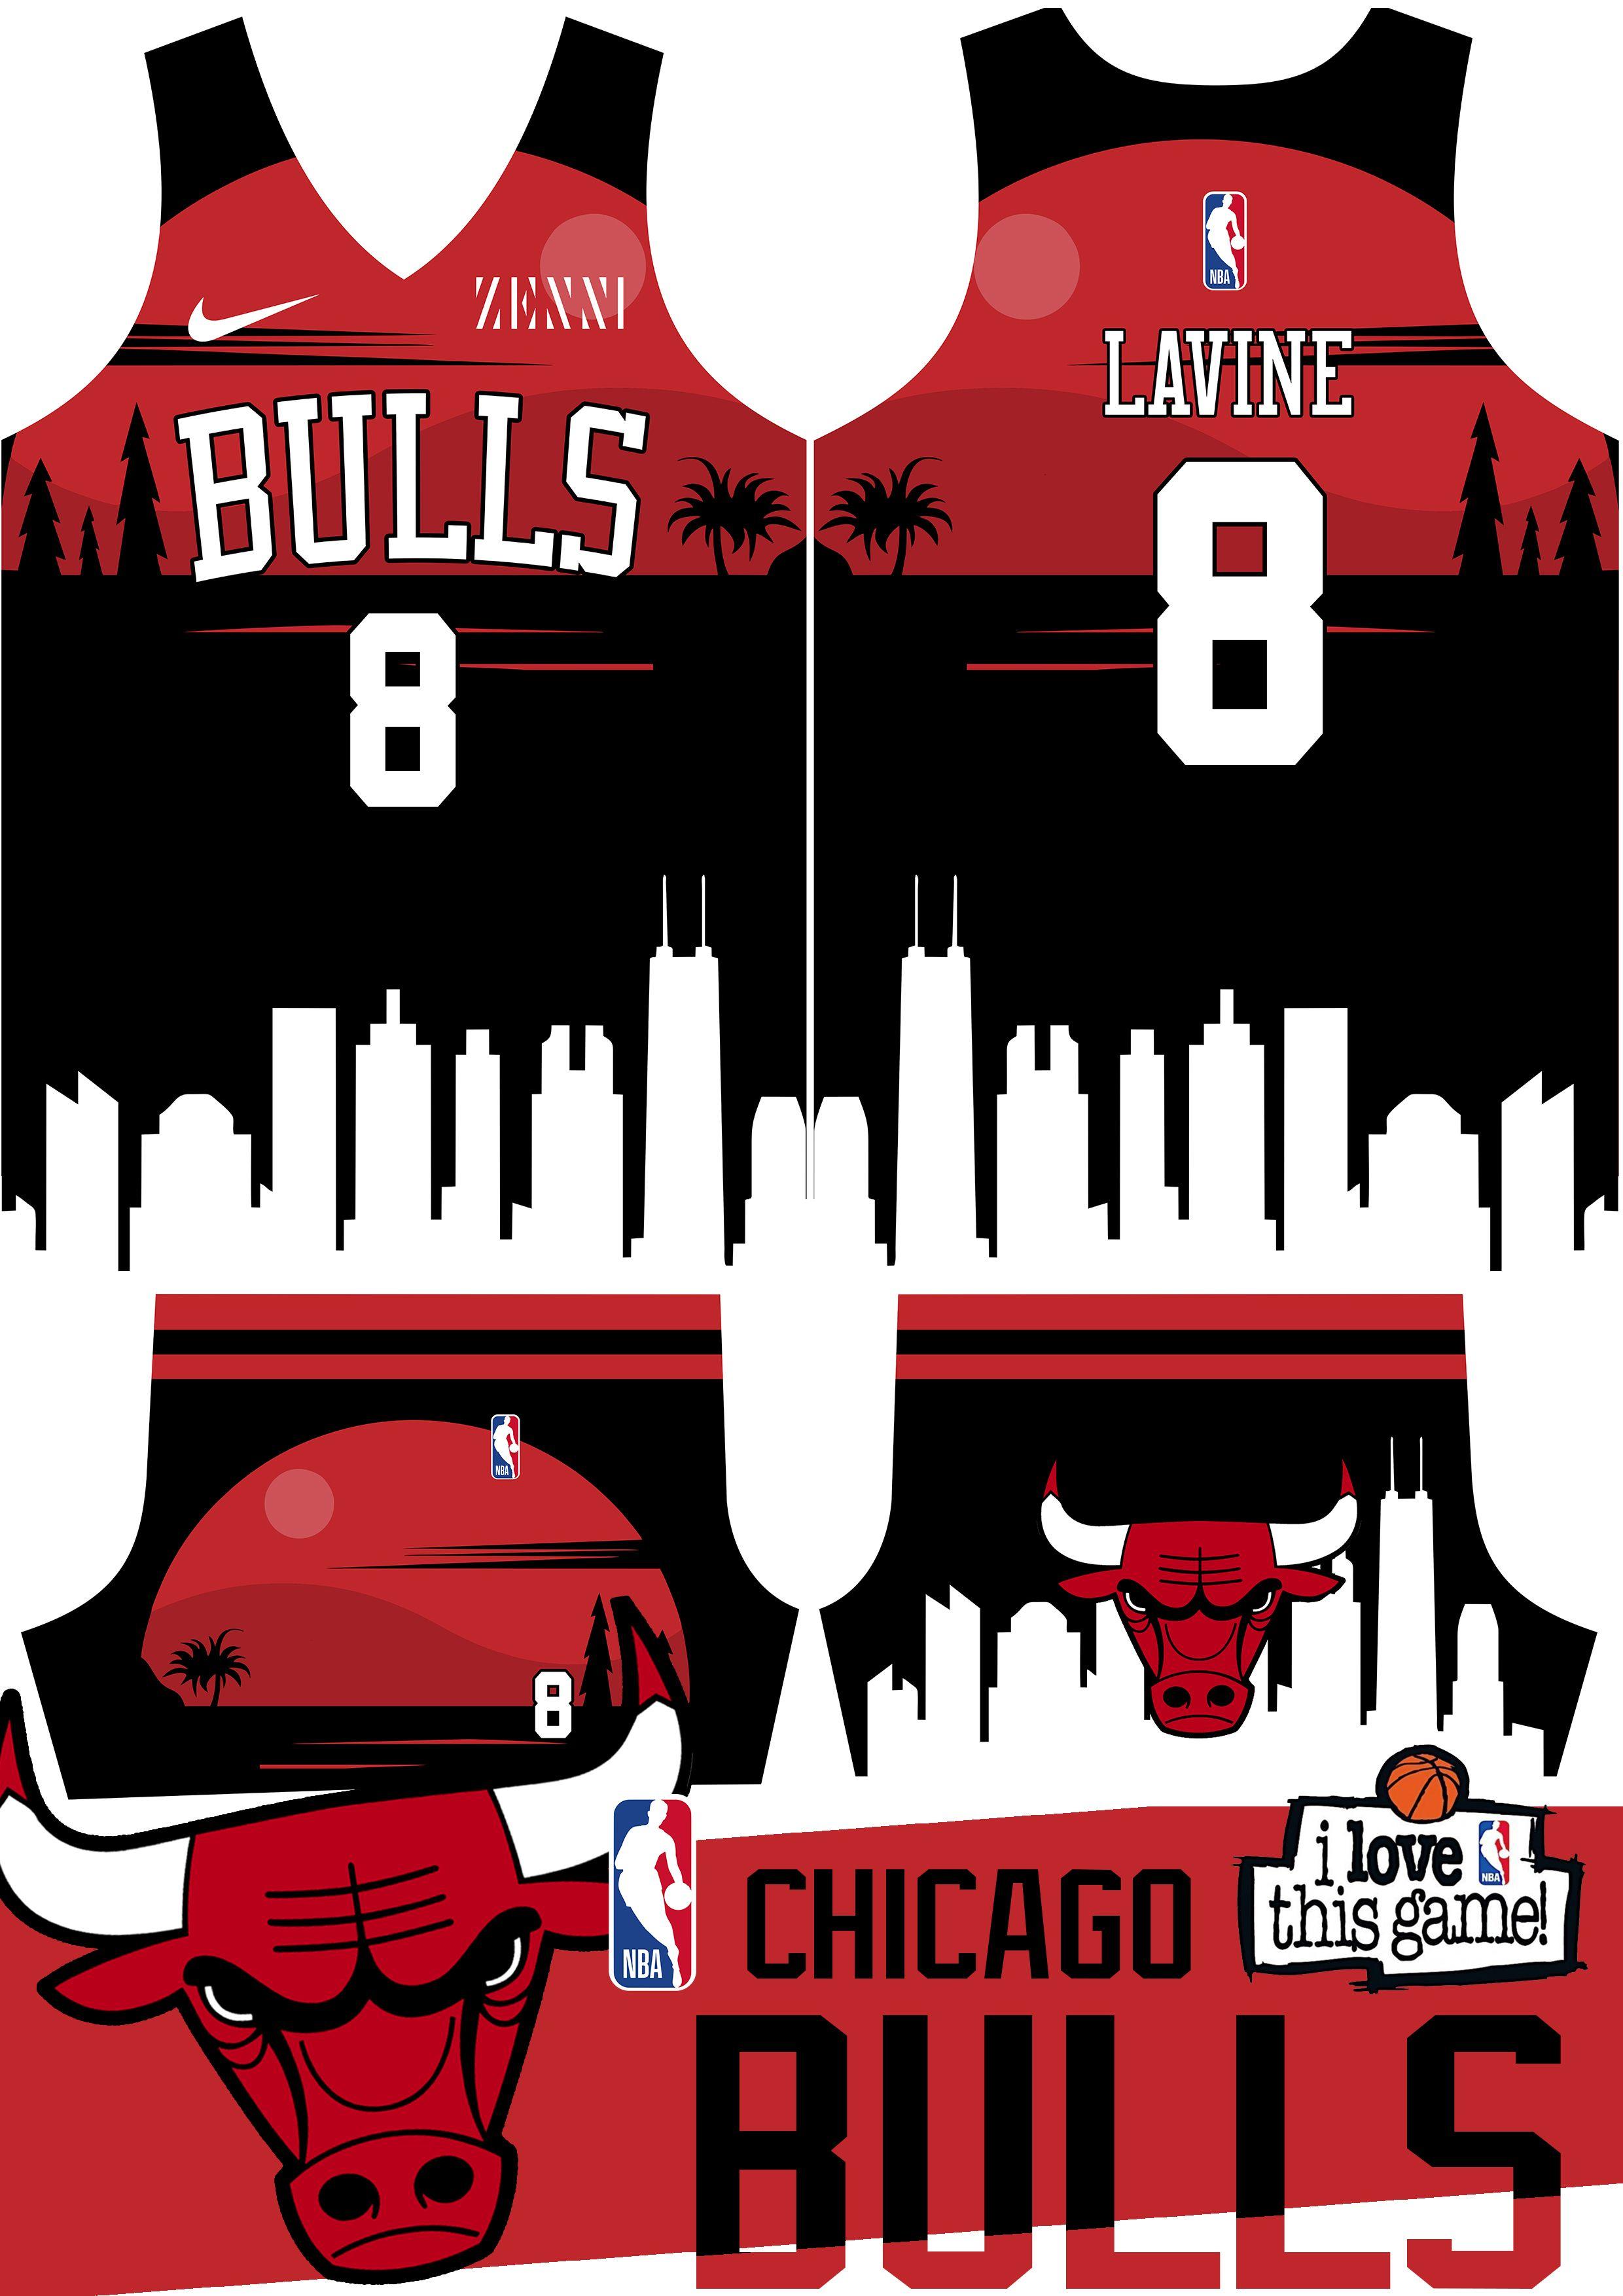 Chicago Bulls Zach Lavine Basketball Jersey In 2020 Basketball Jersey Jersey Design Basketball Uniforms Design